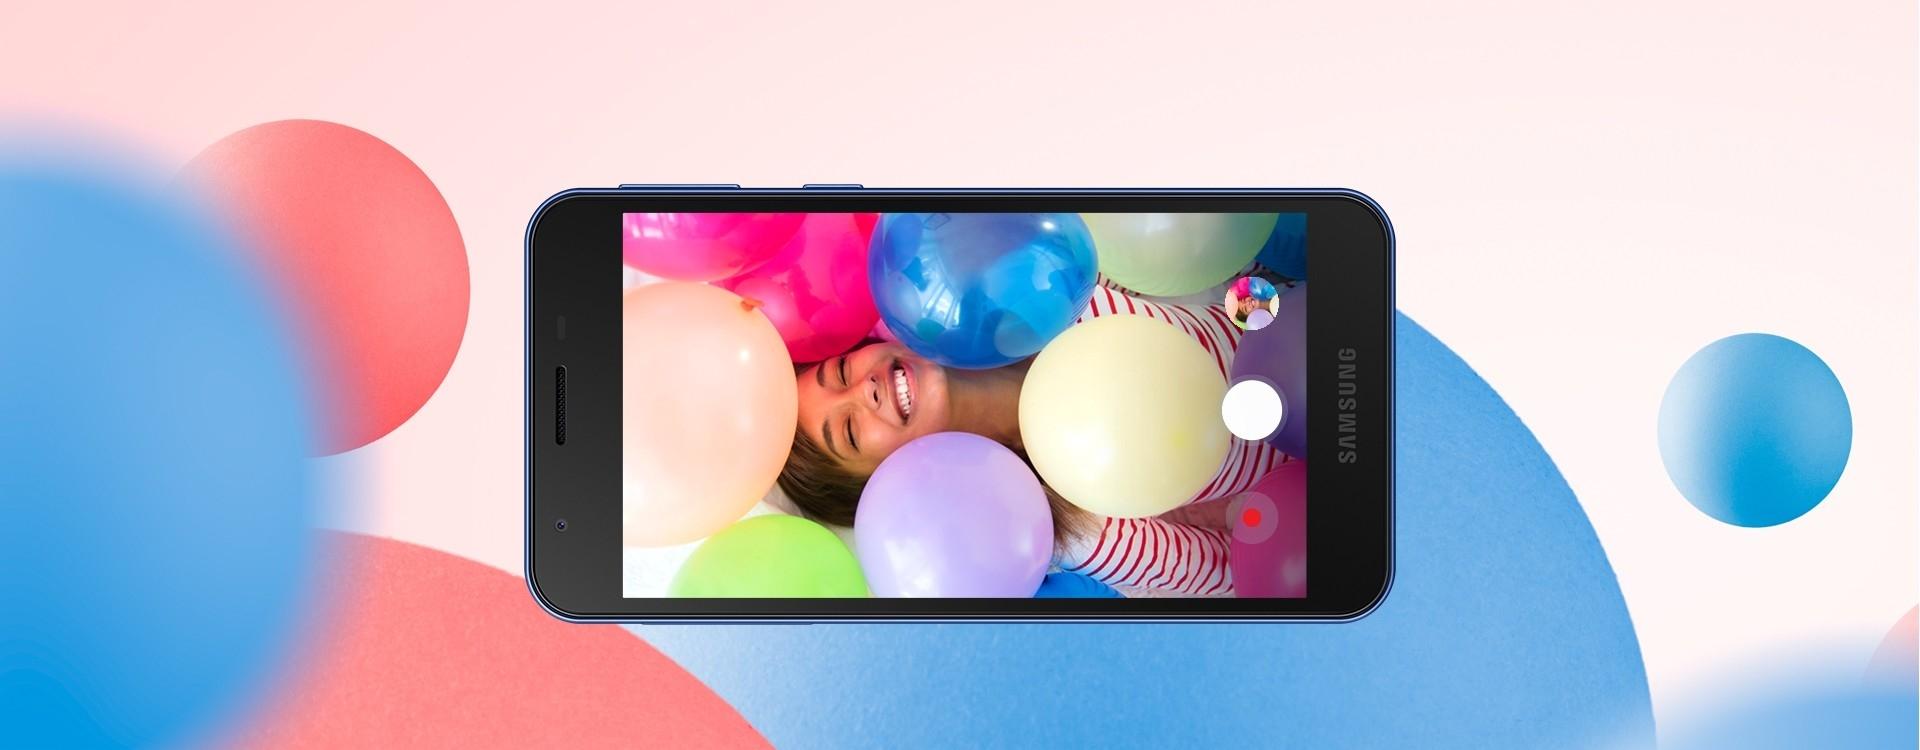 Samsung Galaxy A2 Core Front & Rear Camera